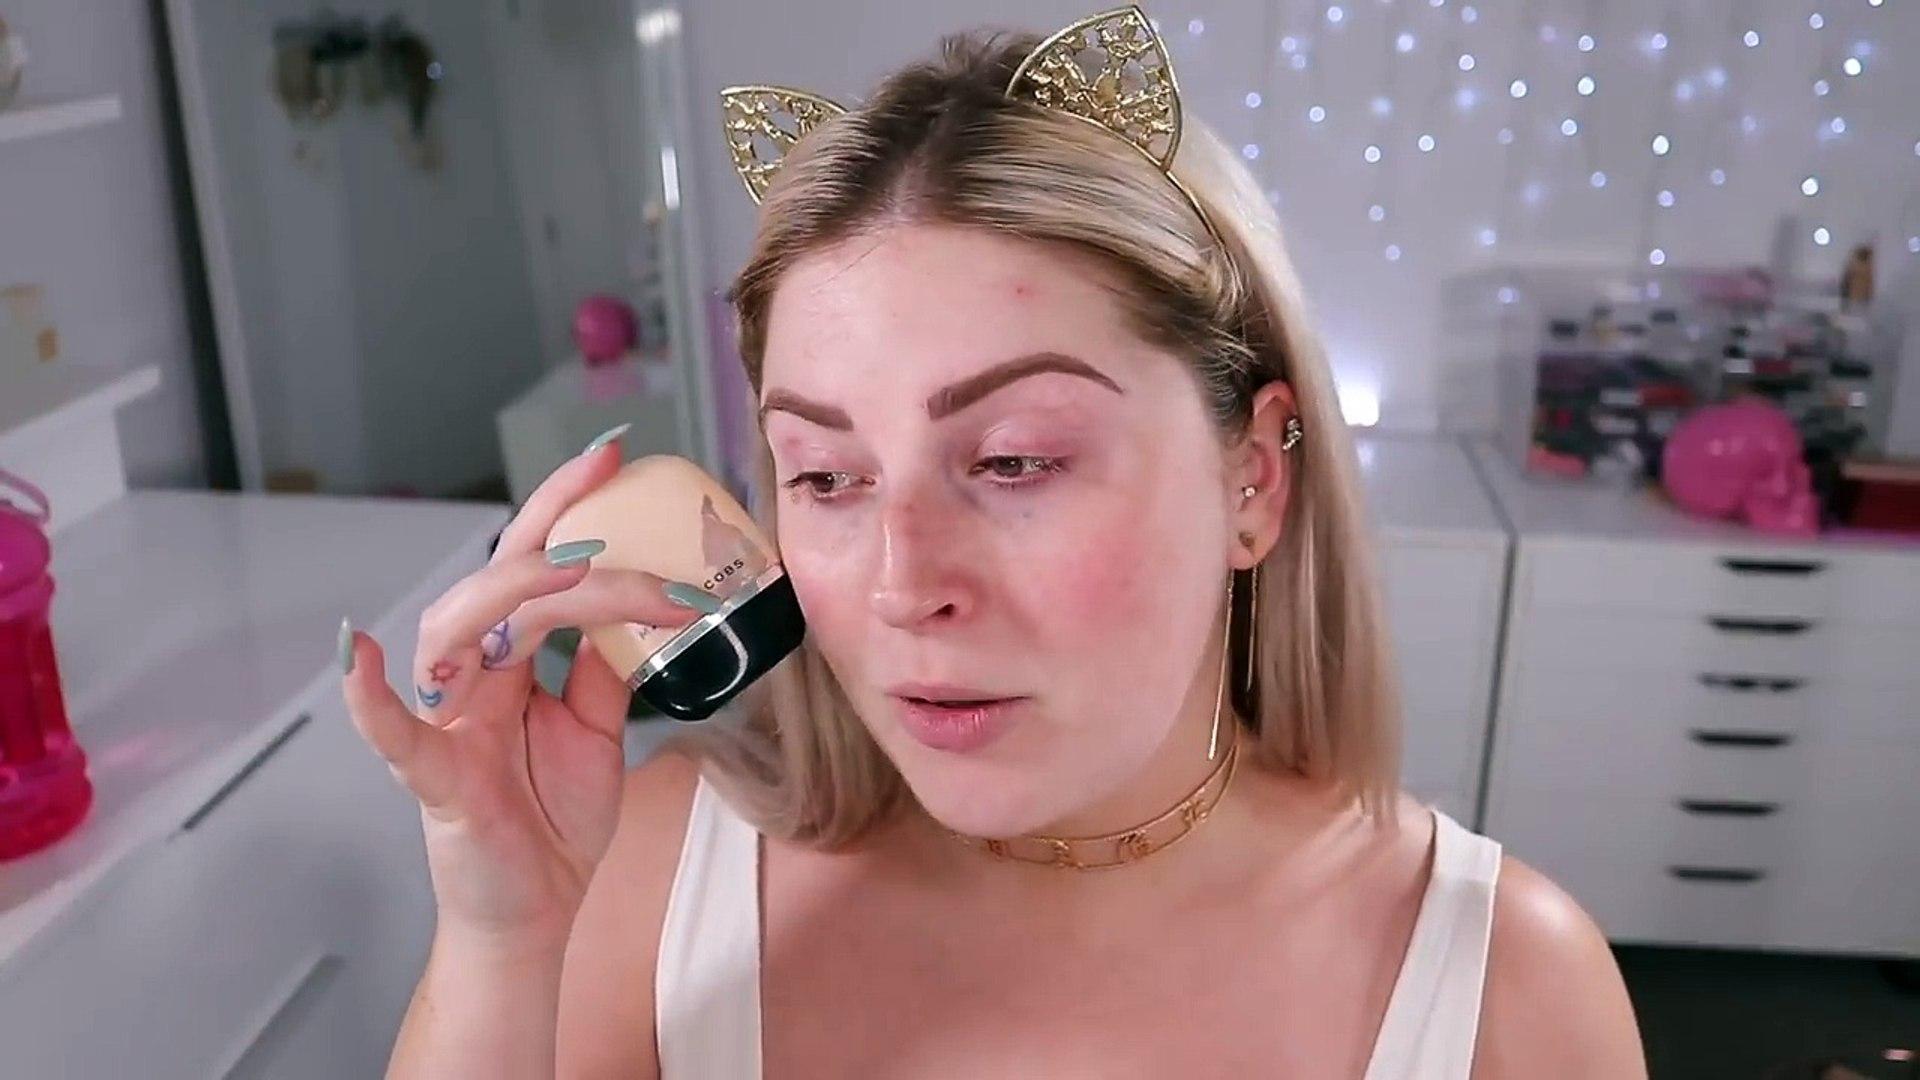 TRUTH OR DARE Makeup Challenge  ft Makeup I Hate!